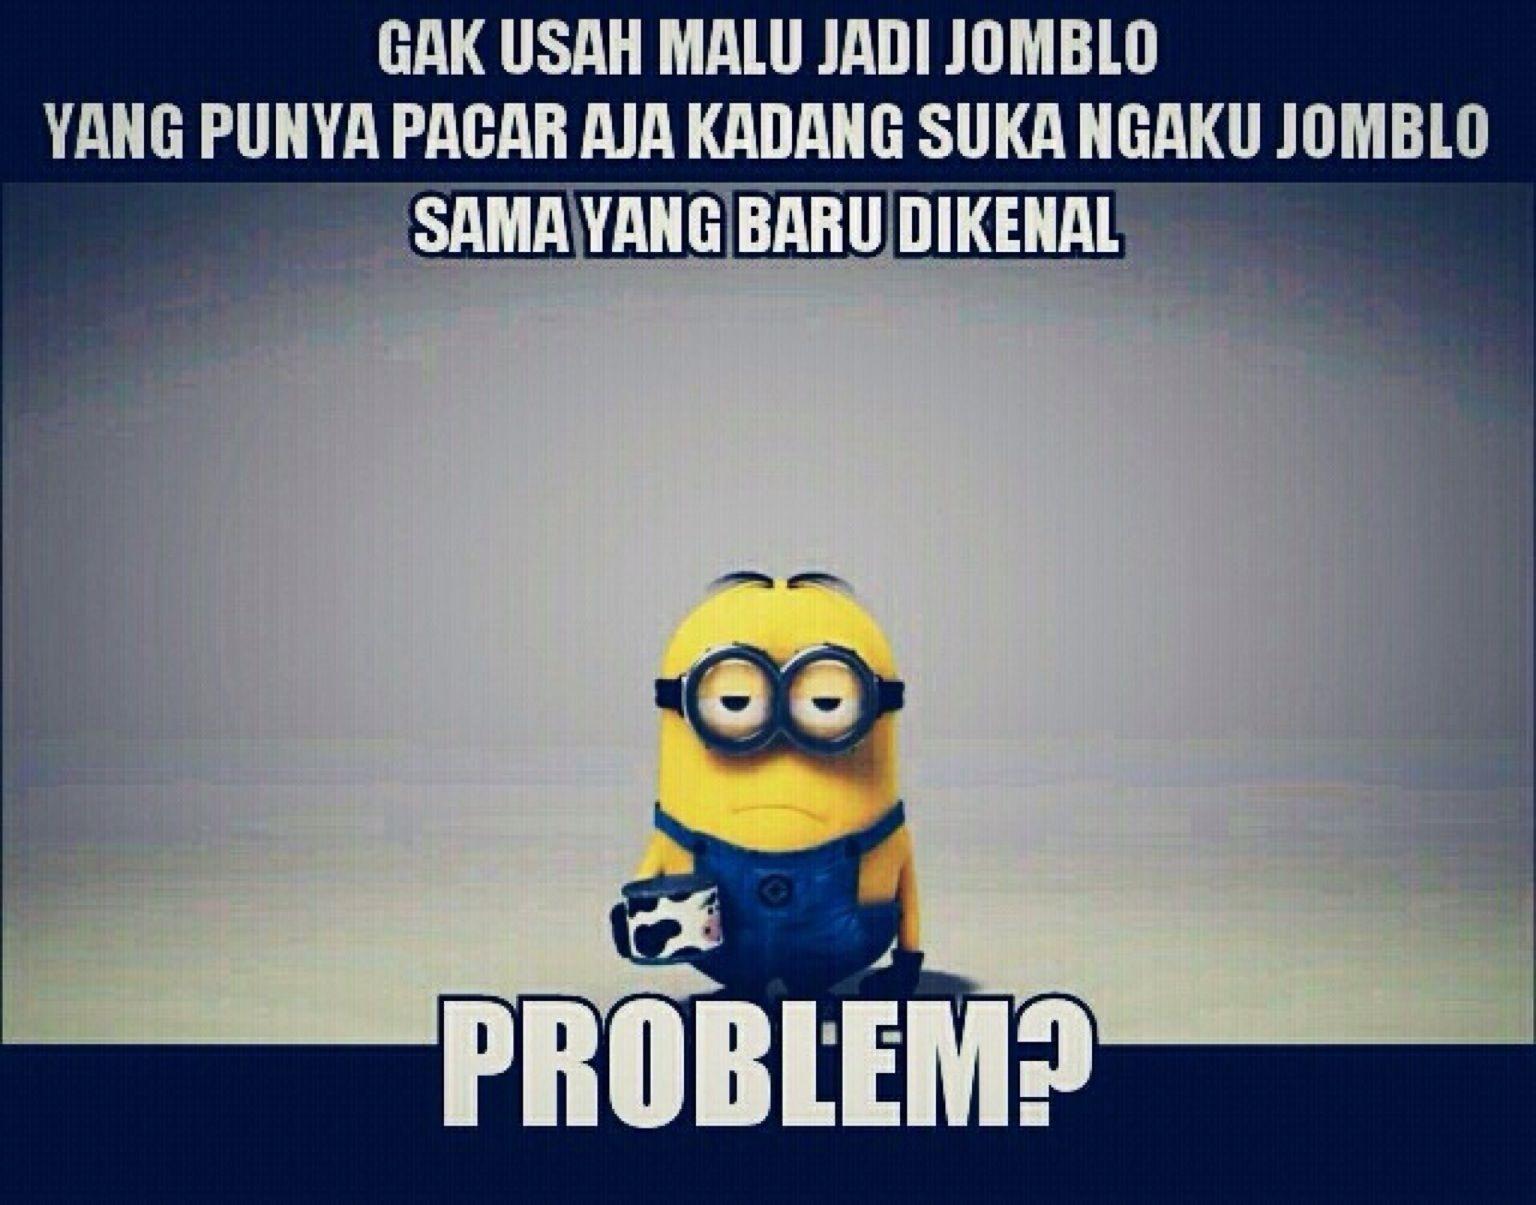 Jomblo cool meme indonesia quotes indonesia meme rage comics funny jokes minion